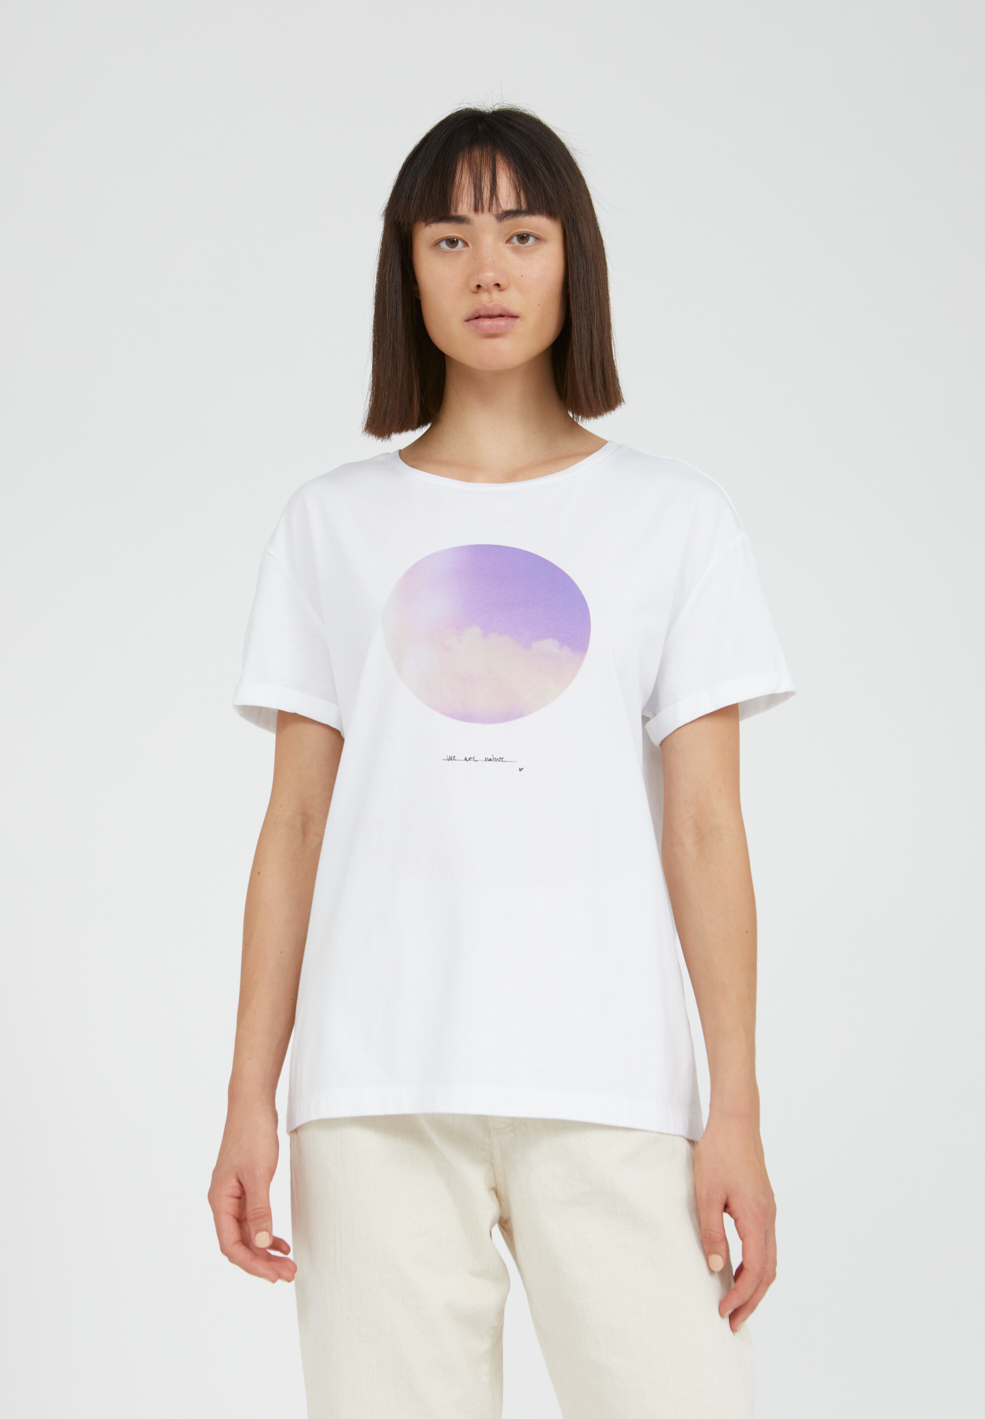 NAALIN-LIGHT-AND-CLOUD-Shirt-white-1